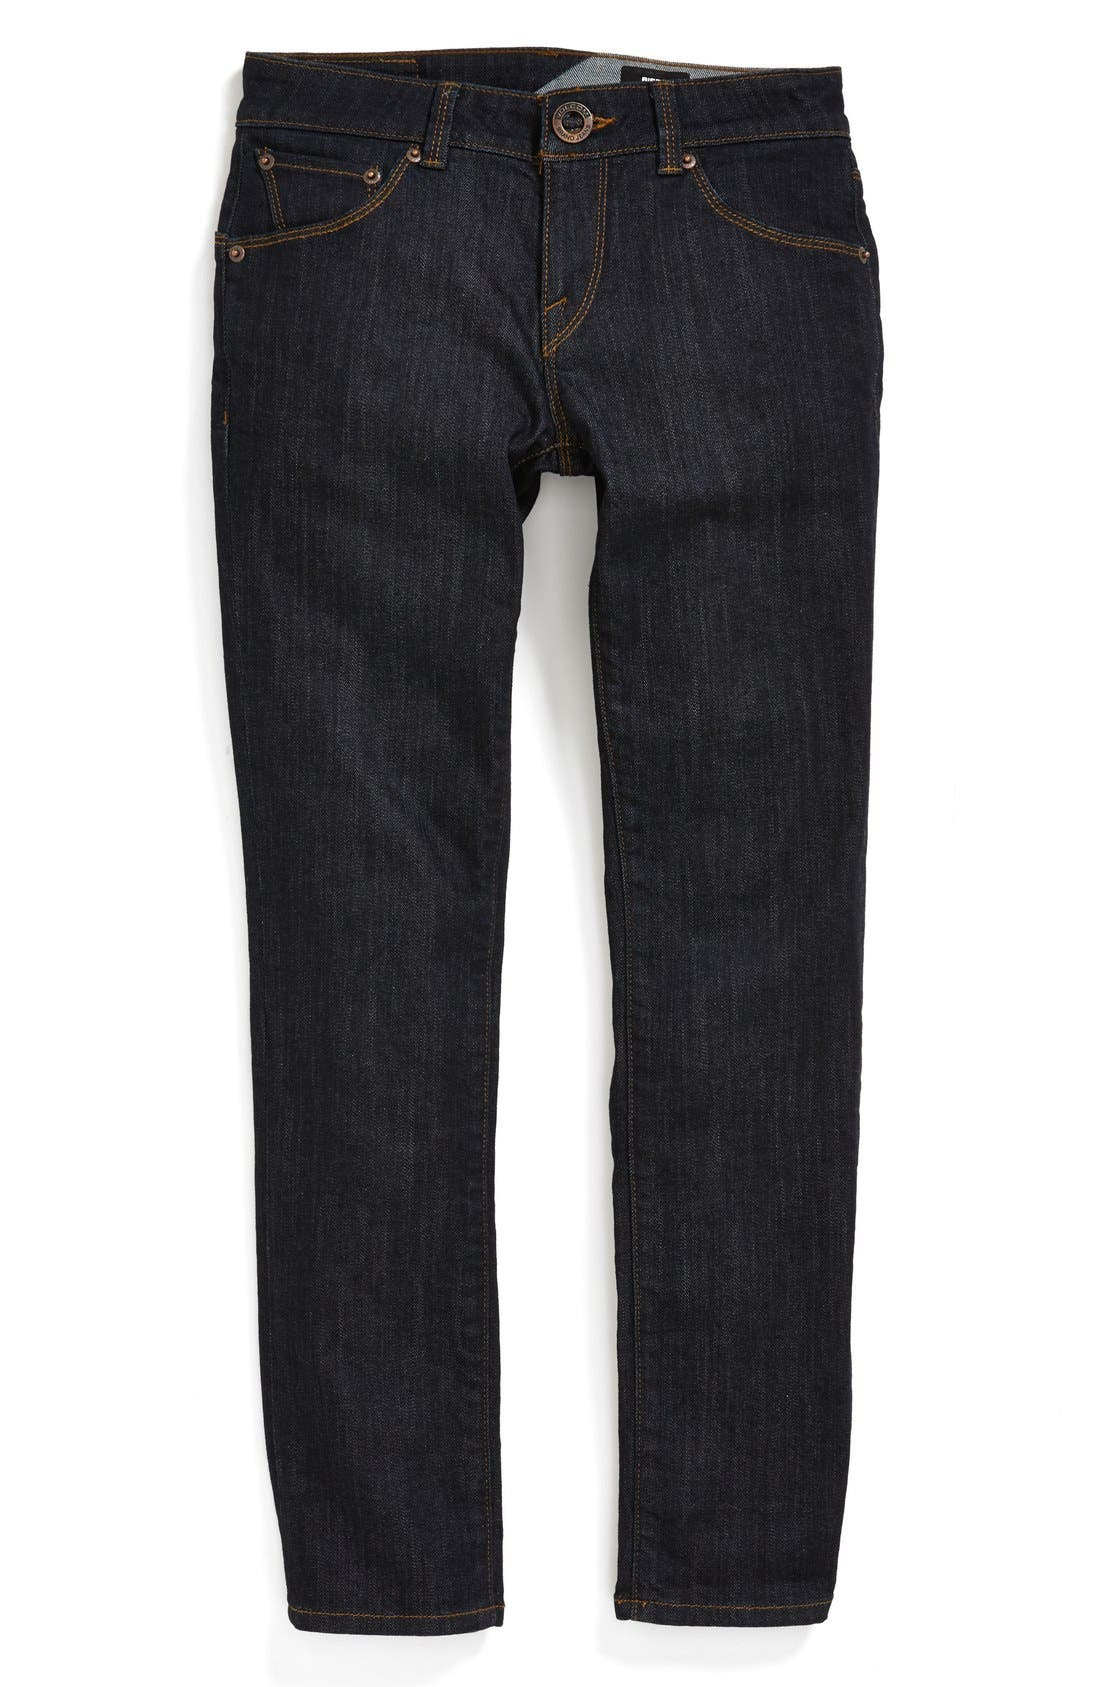 Main Image - Volcom 'Riser' Skinny Straight Leg Jeans (Big Boys)